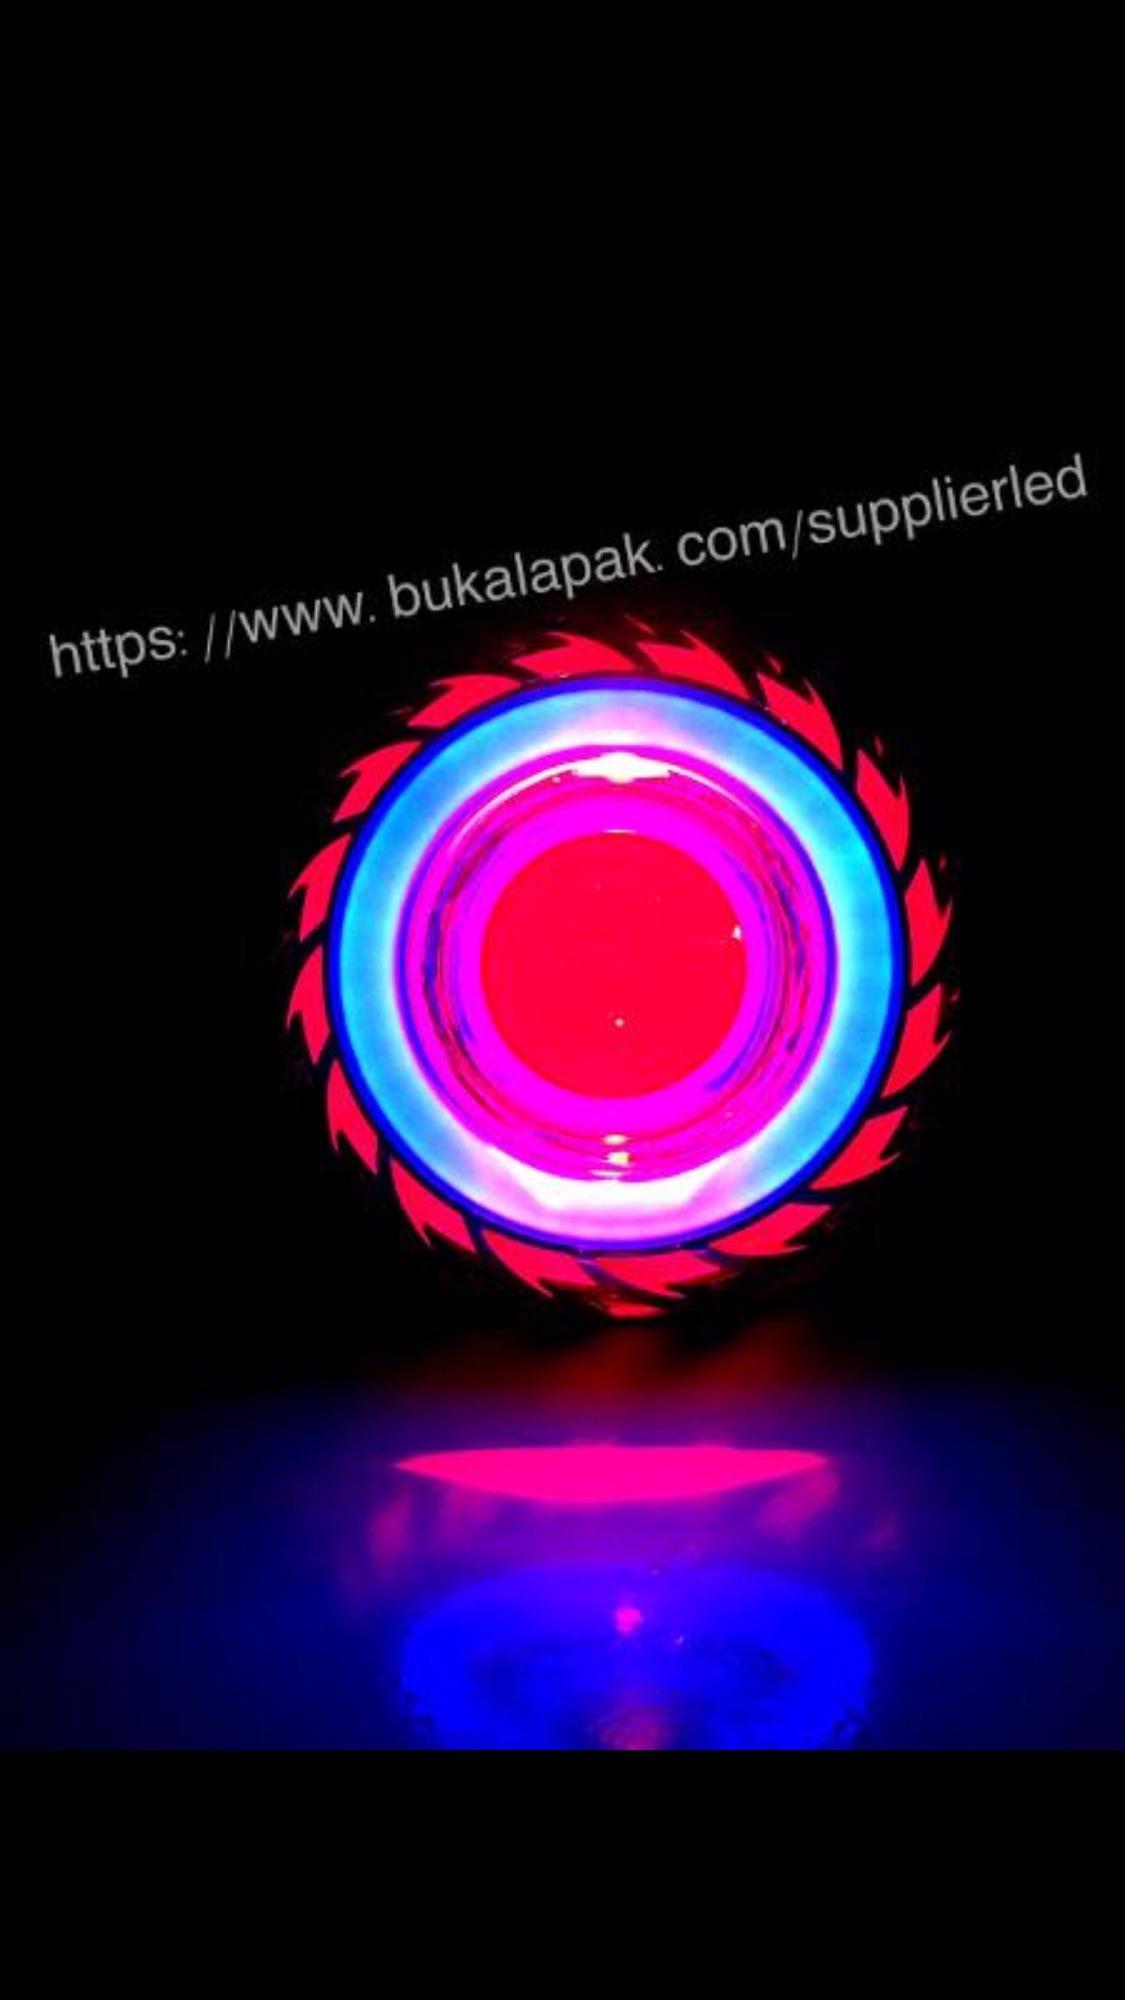 Bohlam Led Hid Motor Terbaru Lampu Senja T10 Jelly Silicon Rgb Remote Projie Tonado Double Ae De Blue Red